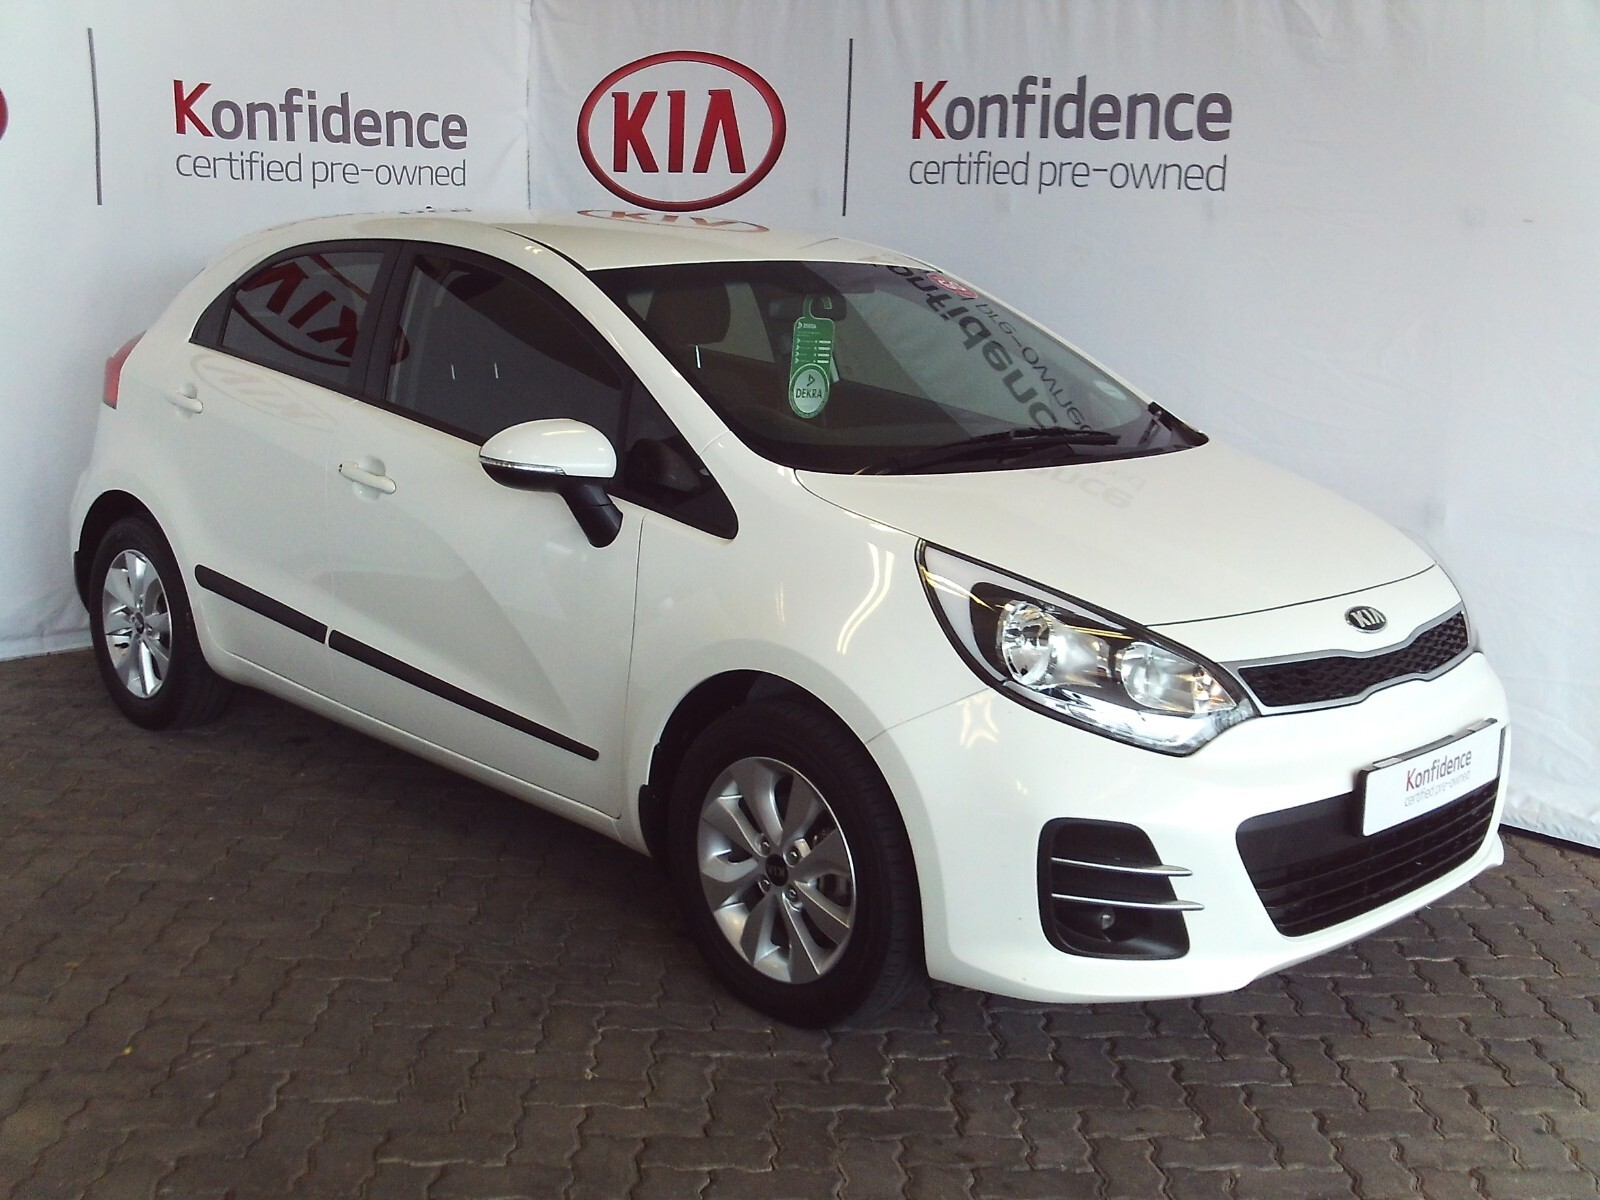 KIA 1.4 EX 5DR Pretoria 0326847